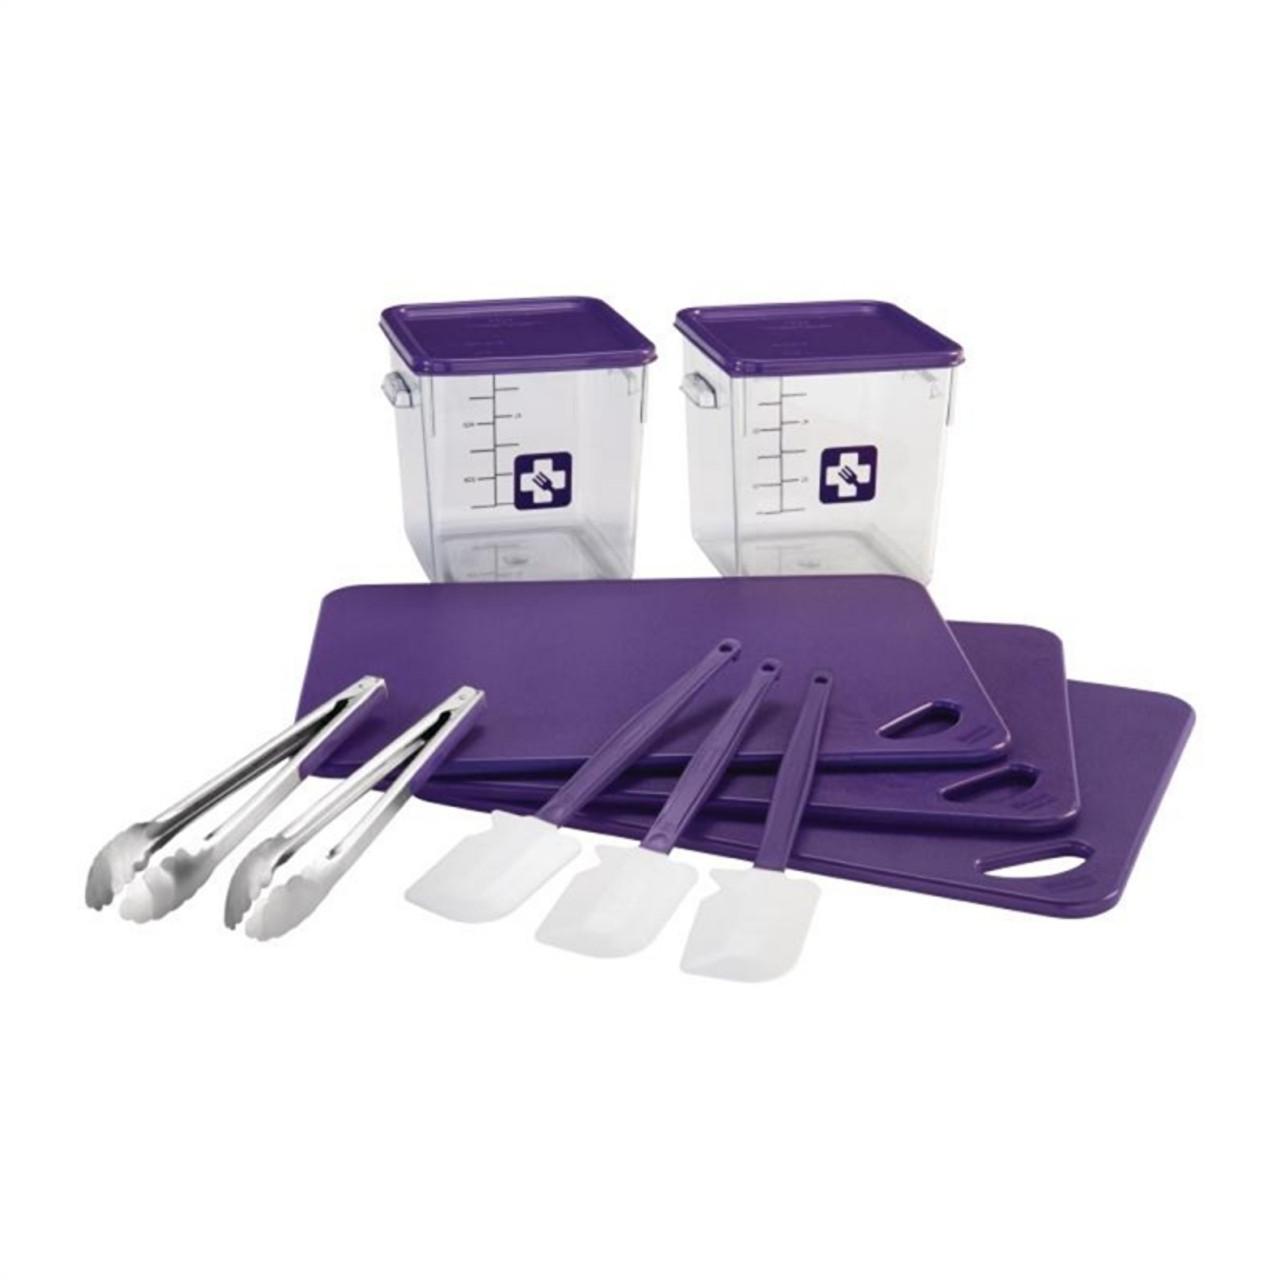 Rubbermaid Food Solution 12 Piece Purple Kit - 2002724